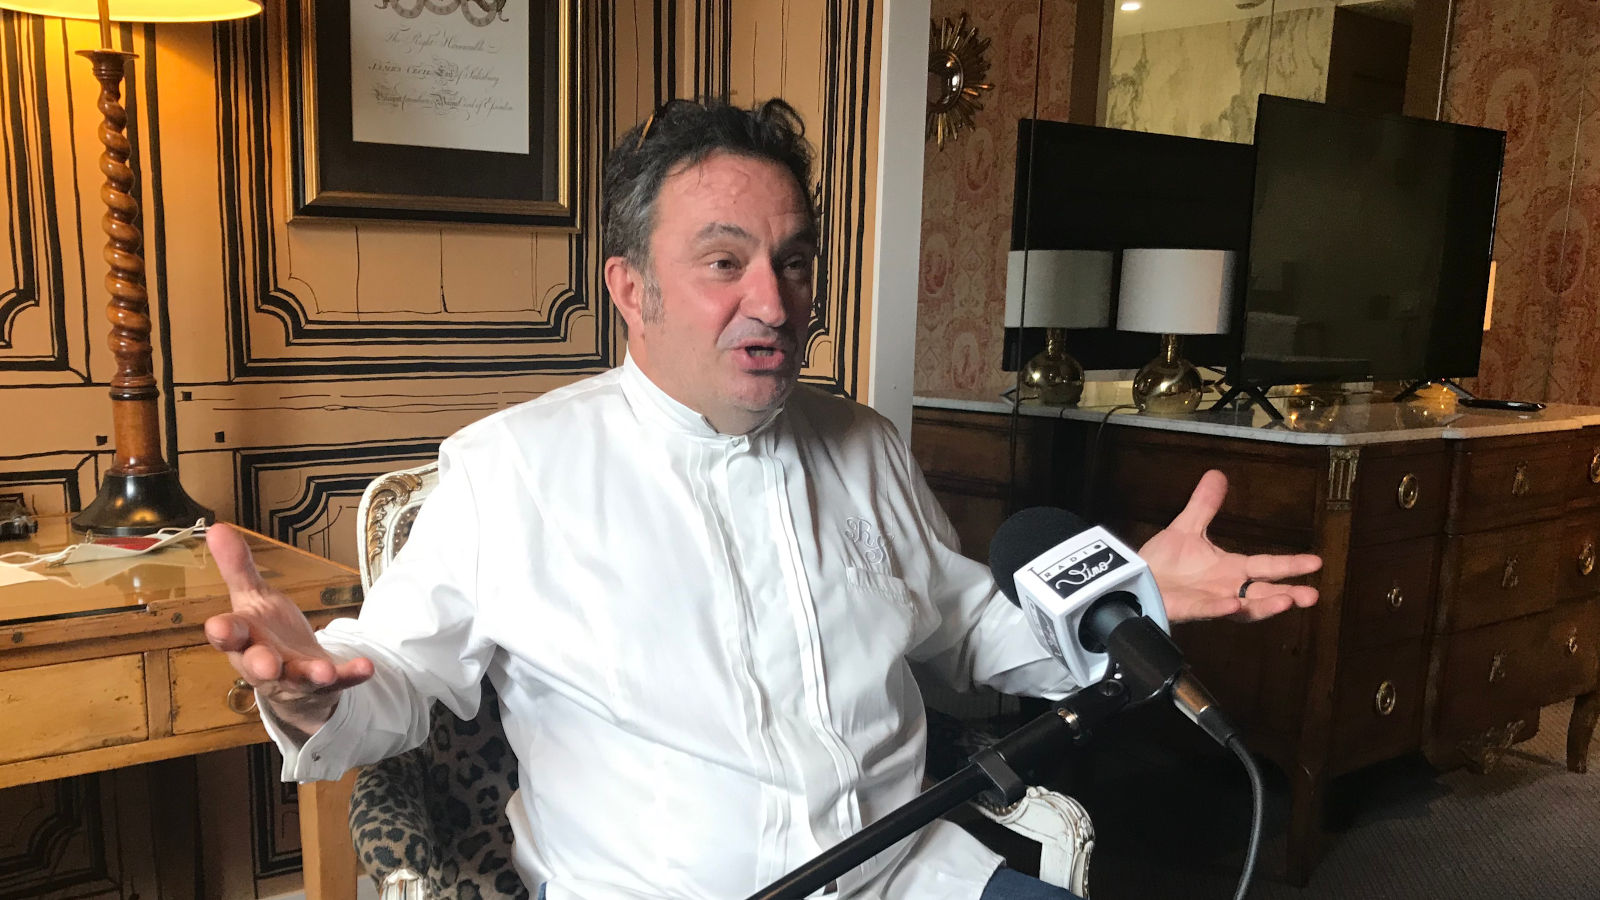 Yves Camdeborde, une révolution intime